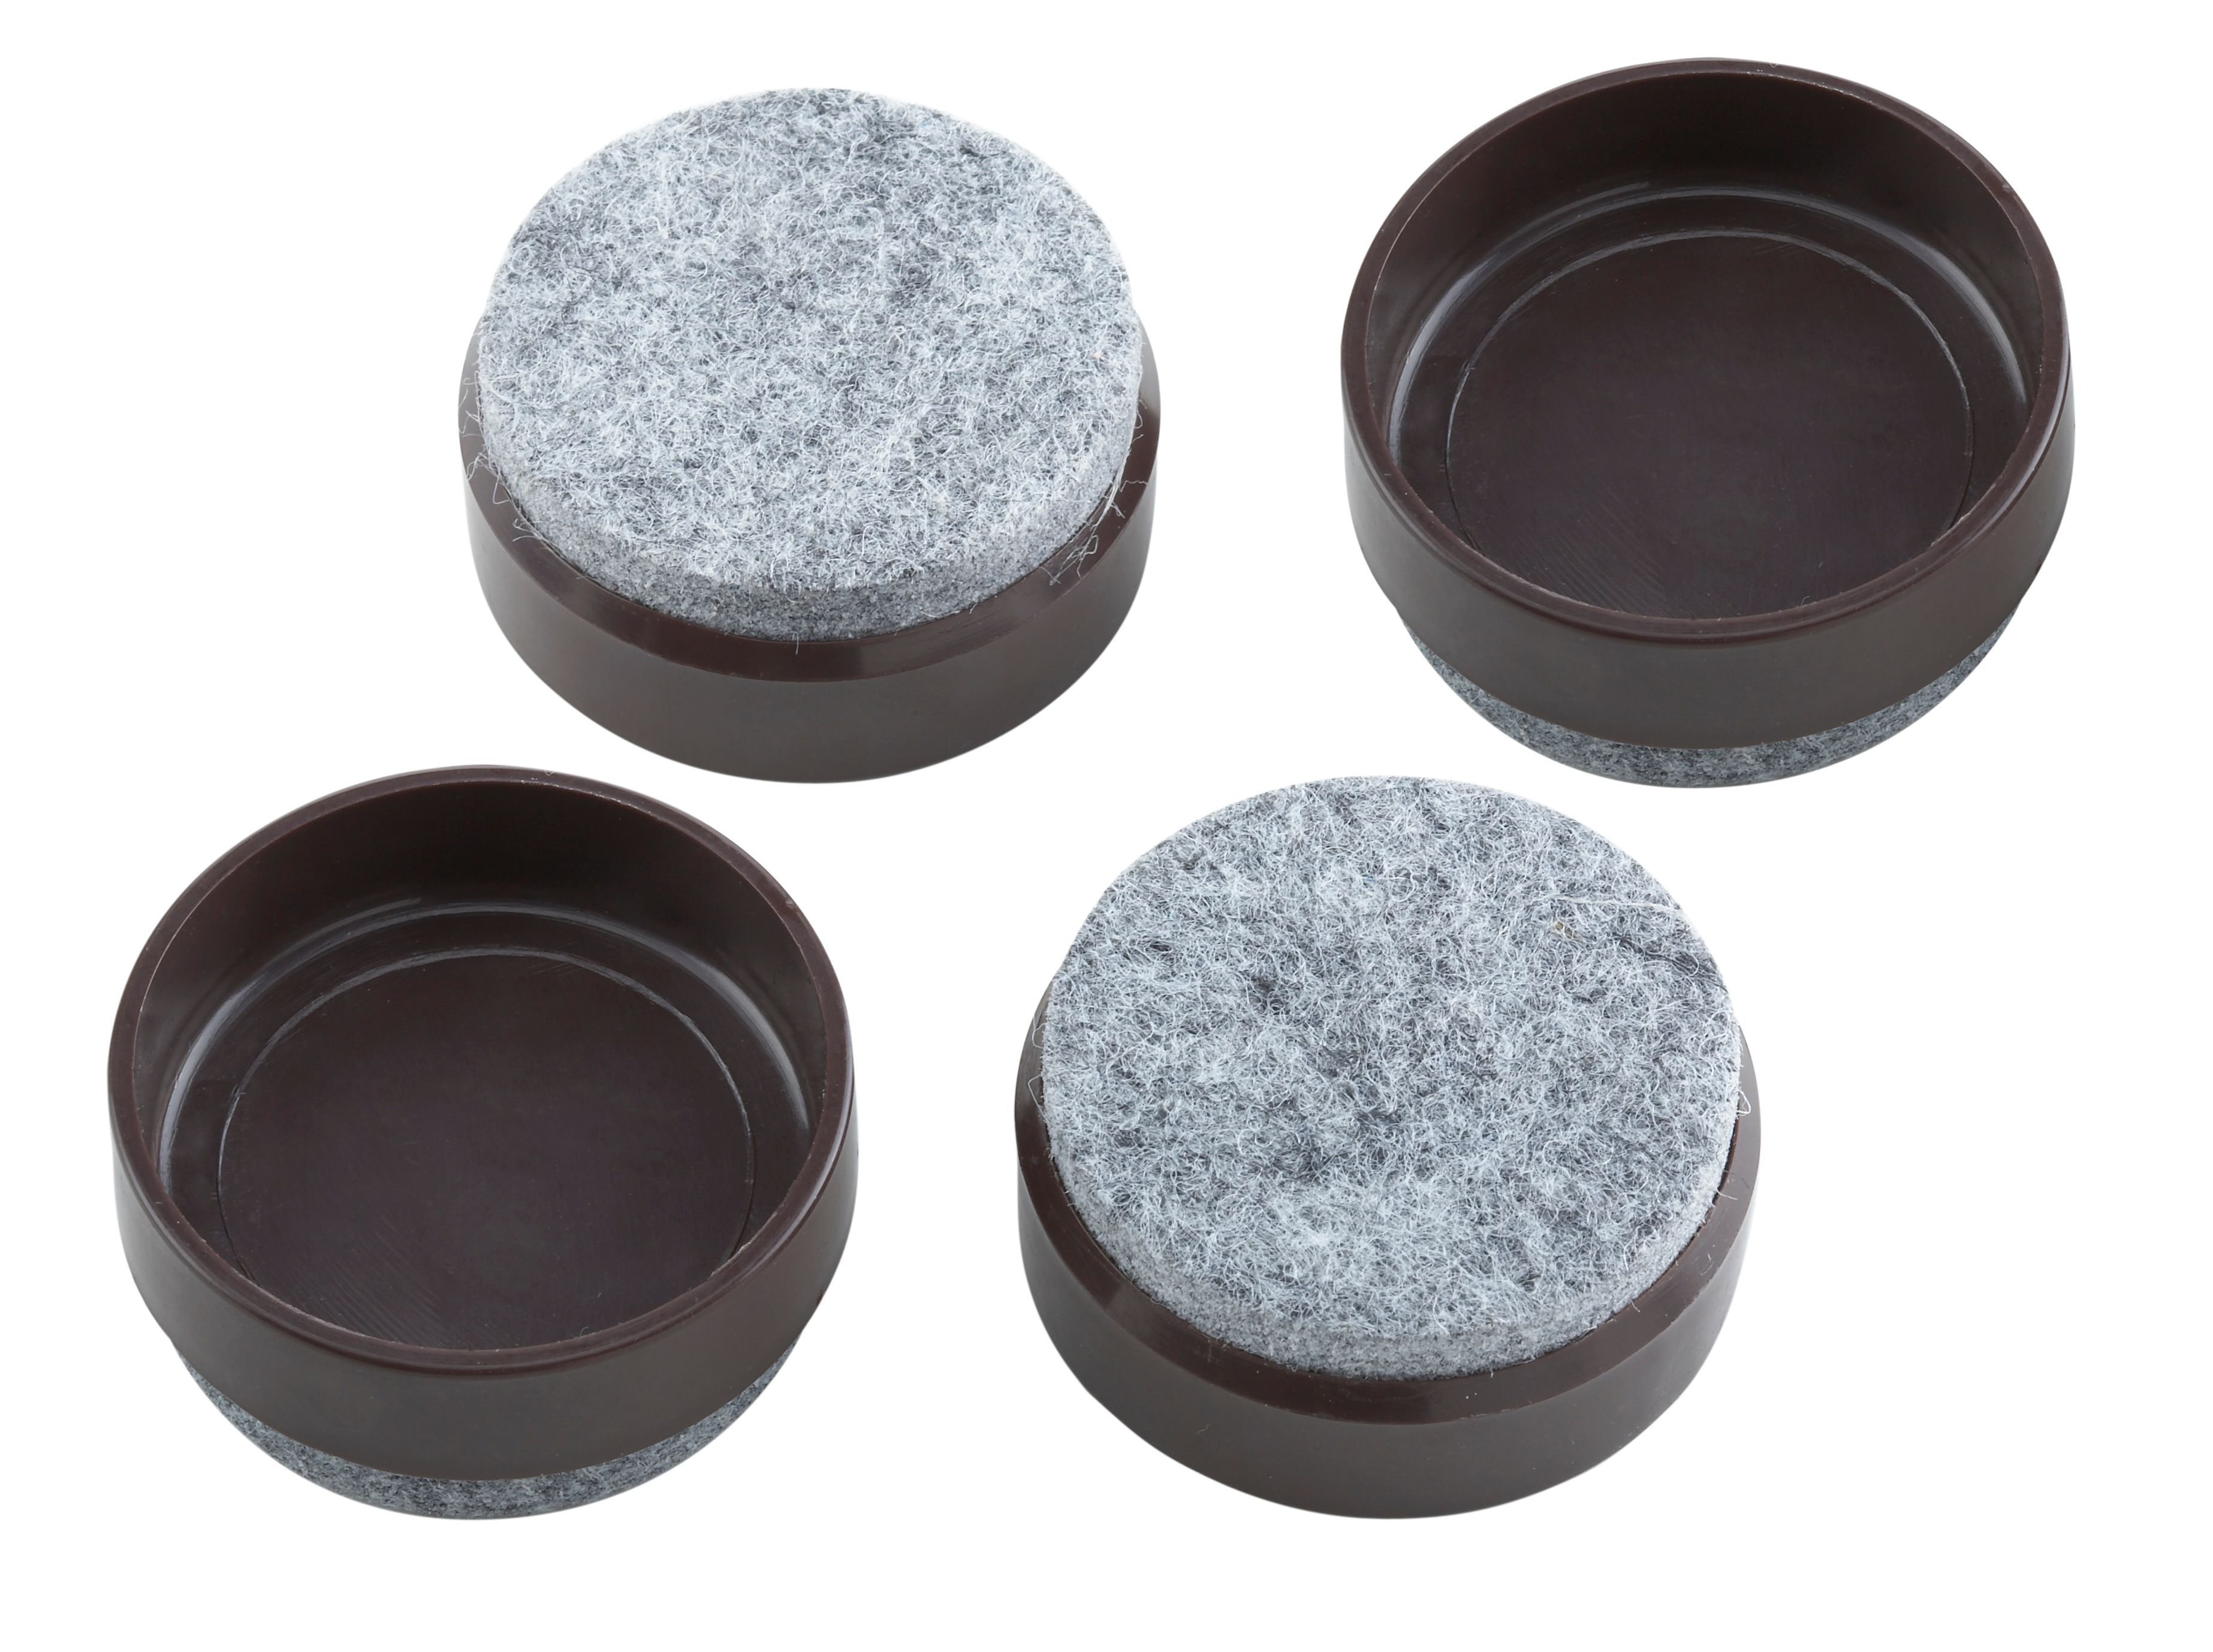 B&Q Brown Felt & Plastic Castor Cup Dia 45mm Pack of 4